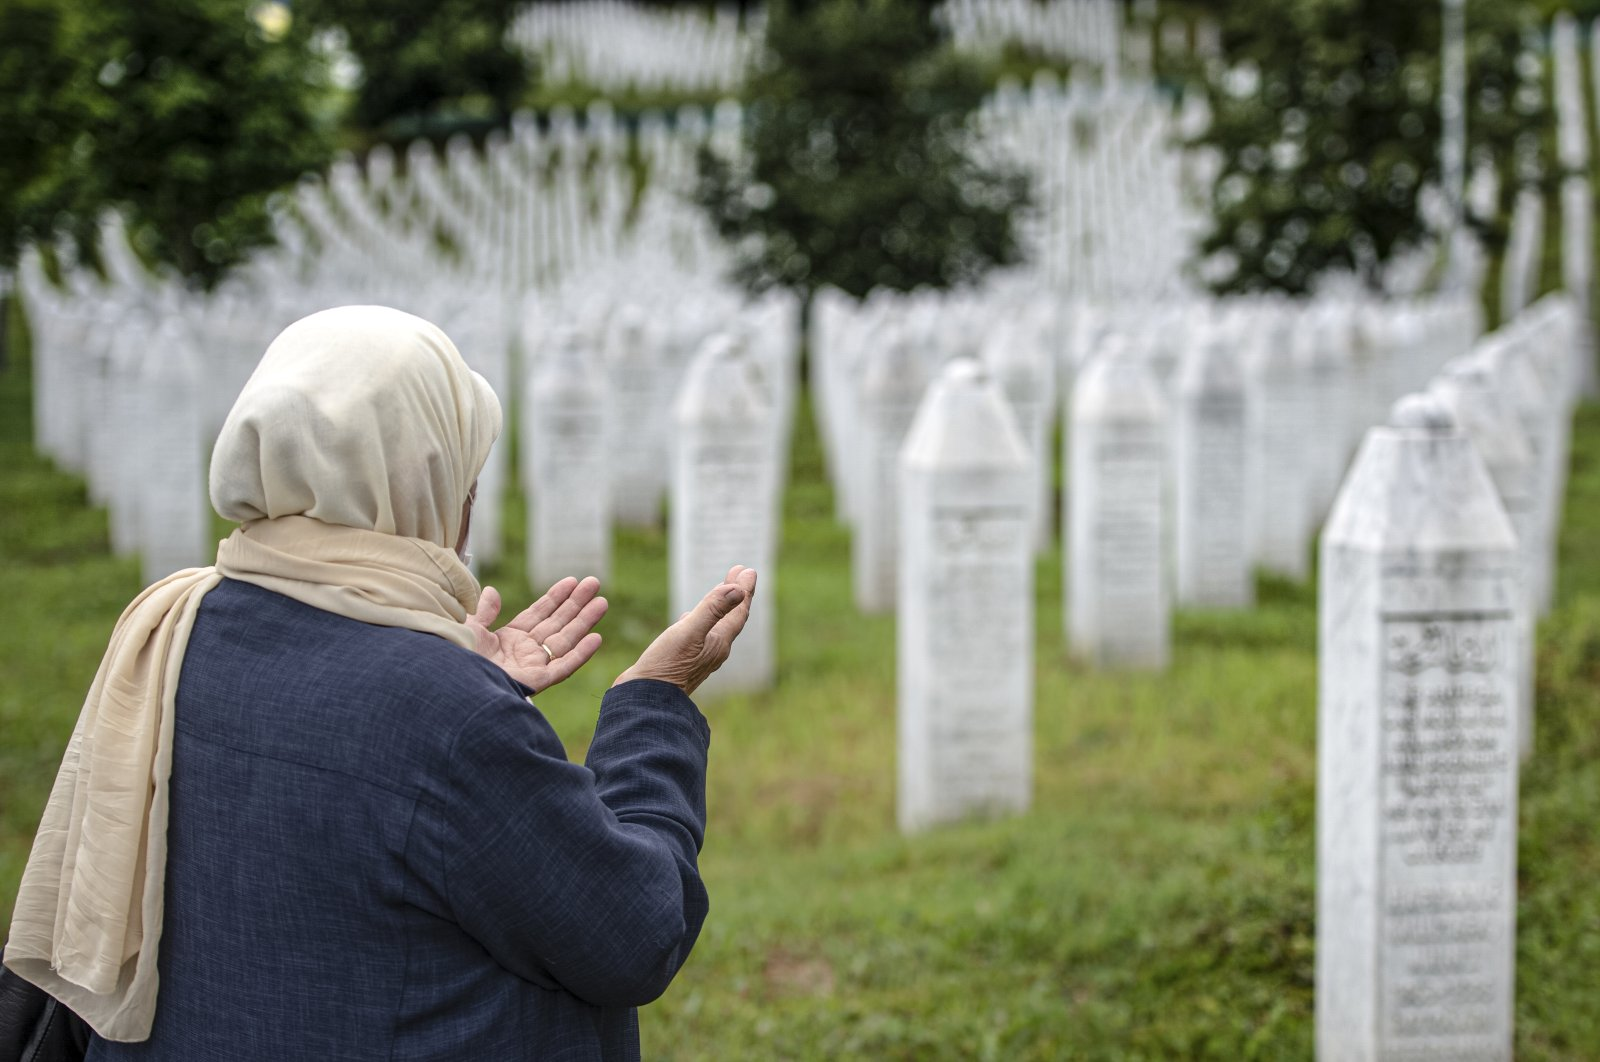 A woman prays at the memorial cemetery in Potocari, near Srebrenica, Bosnia-Herzegovina, July 7, 2020. (AP Photo)